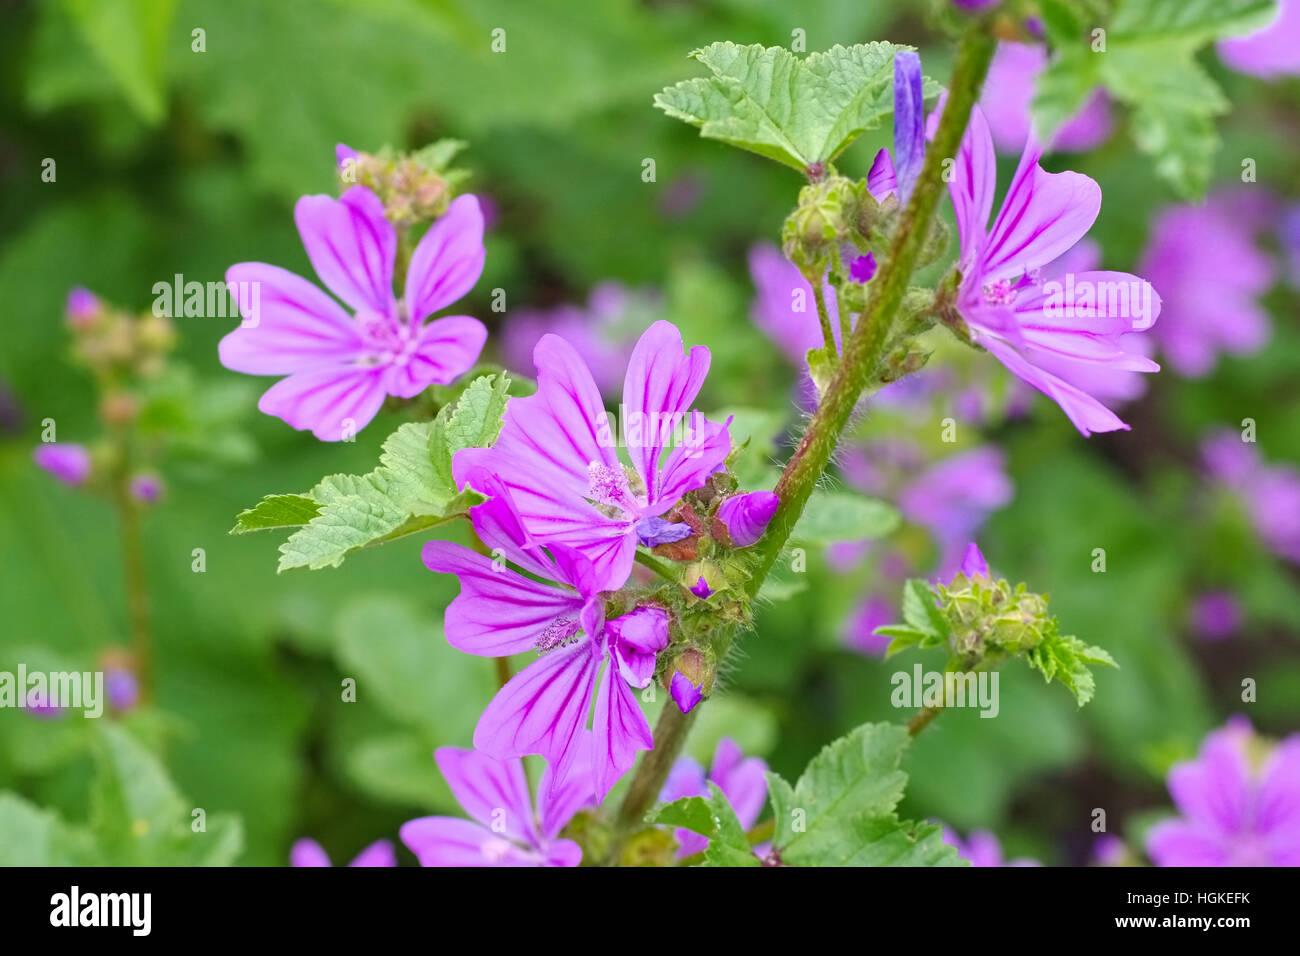 wilde Malve - purple malva sylvestris, a medicinal plant Stock Photo